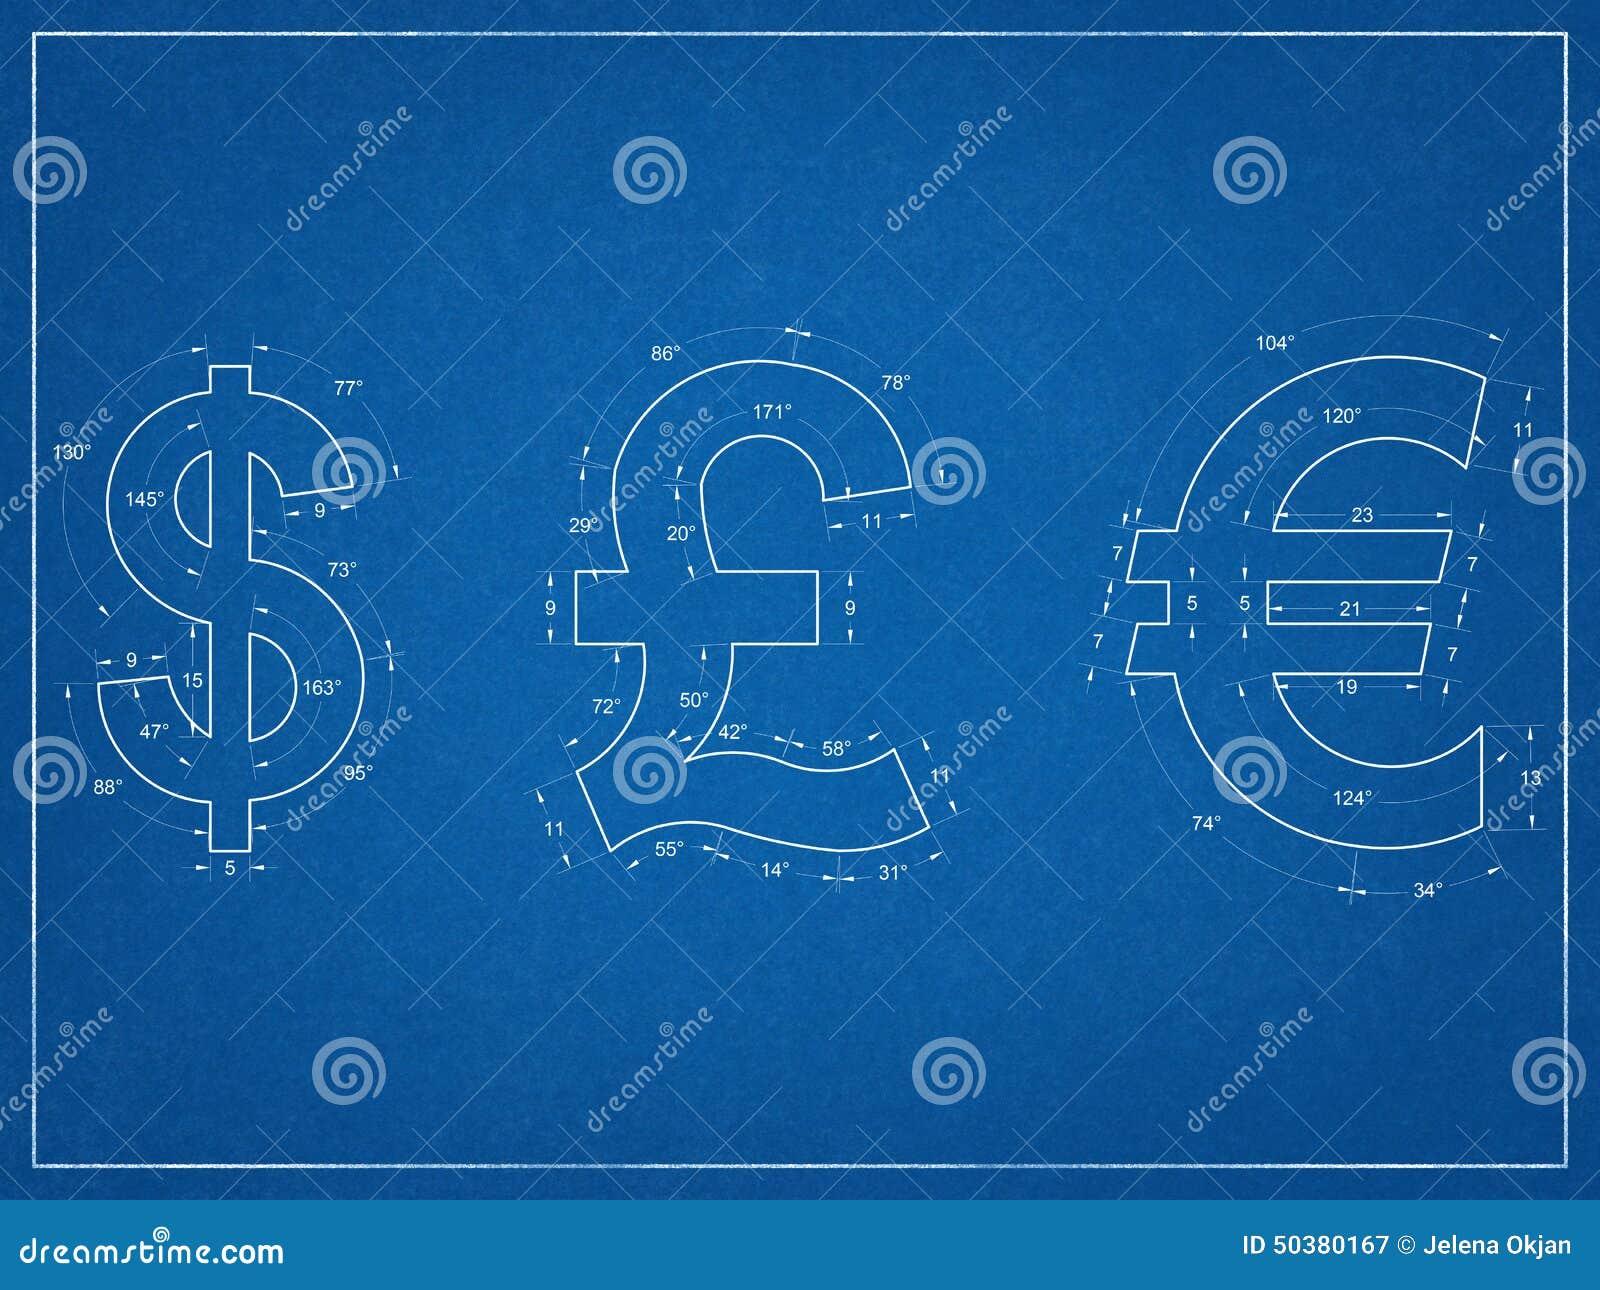 Us Dollar British Pound Euro Symbols Blueprint Stock Illustration